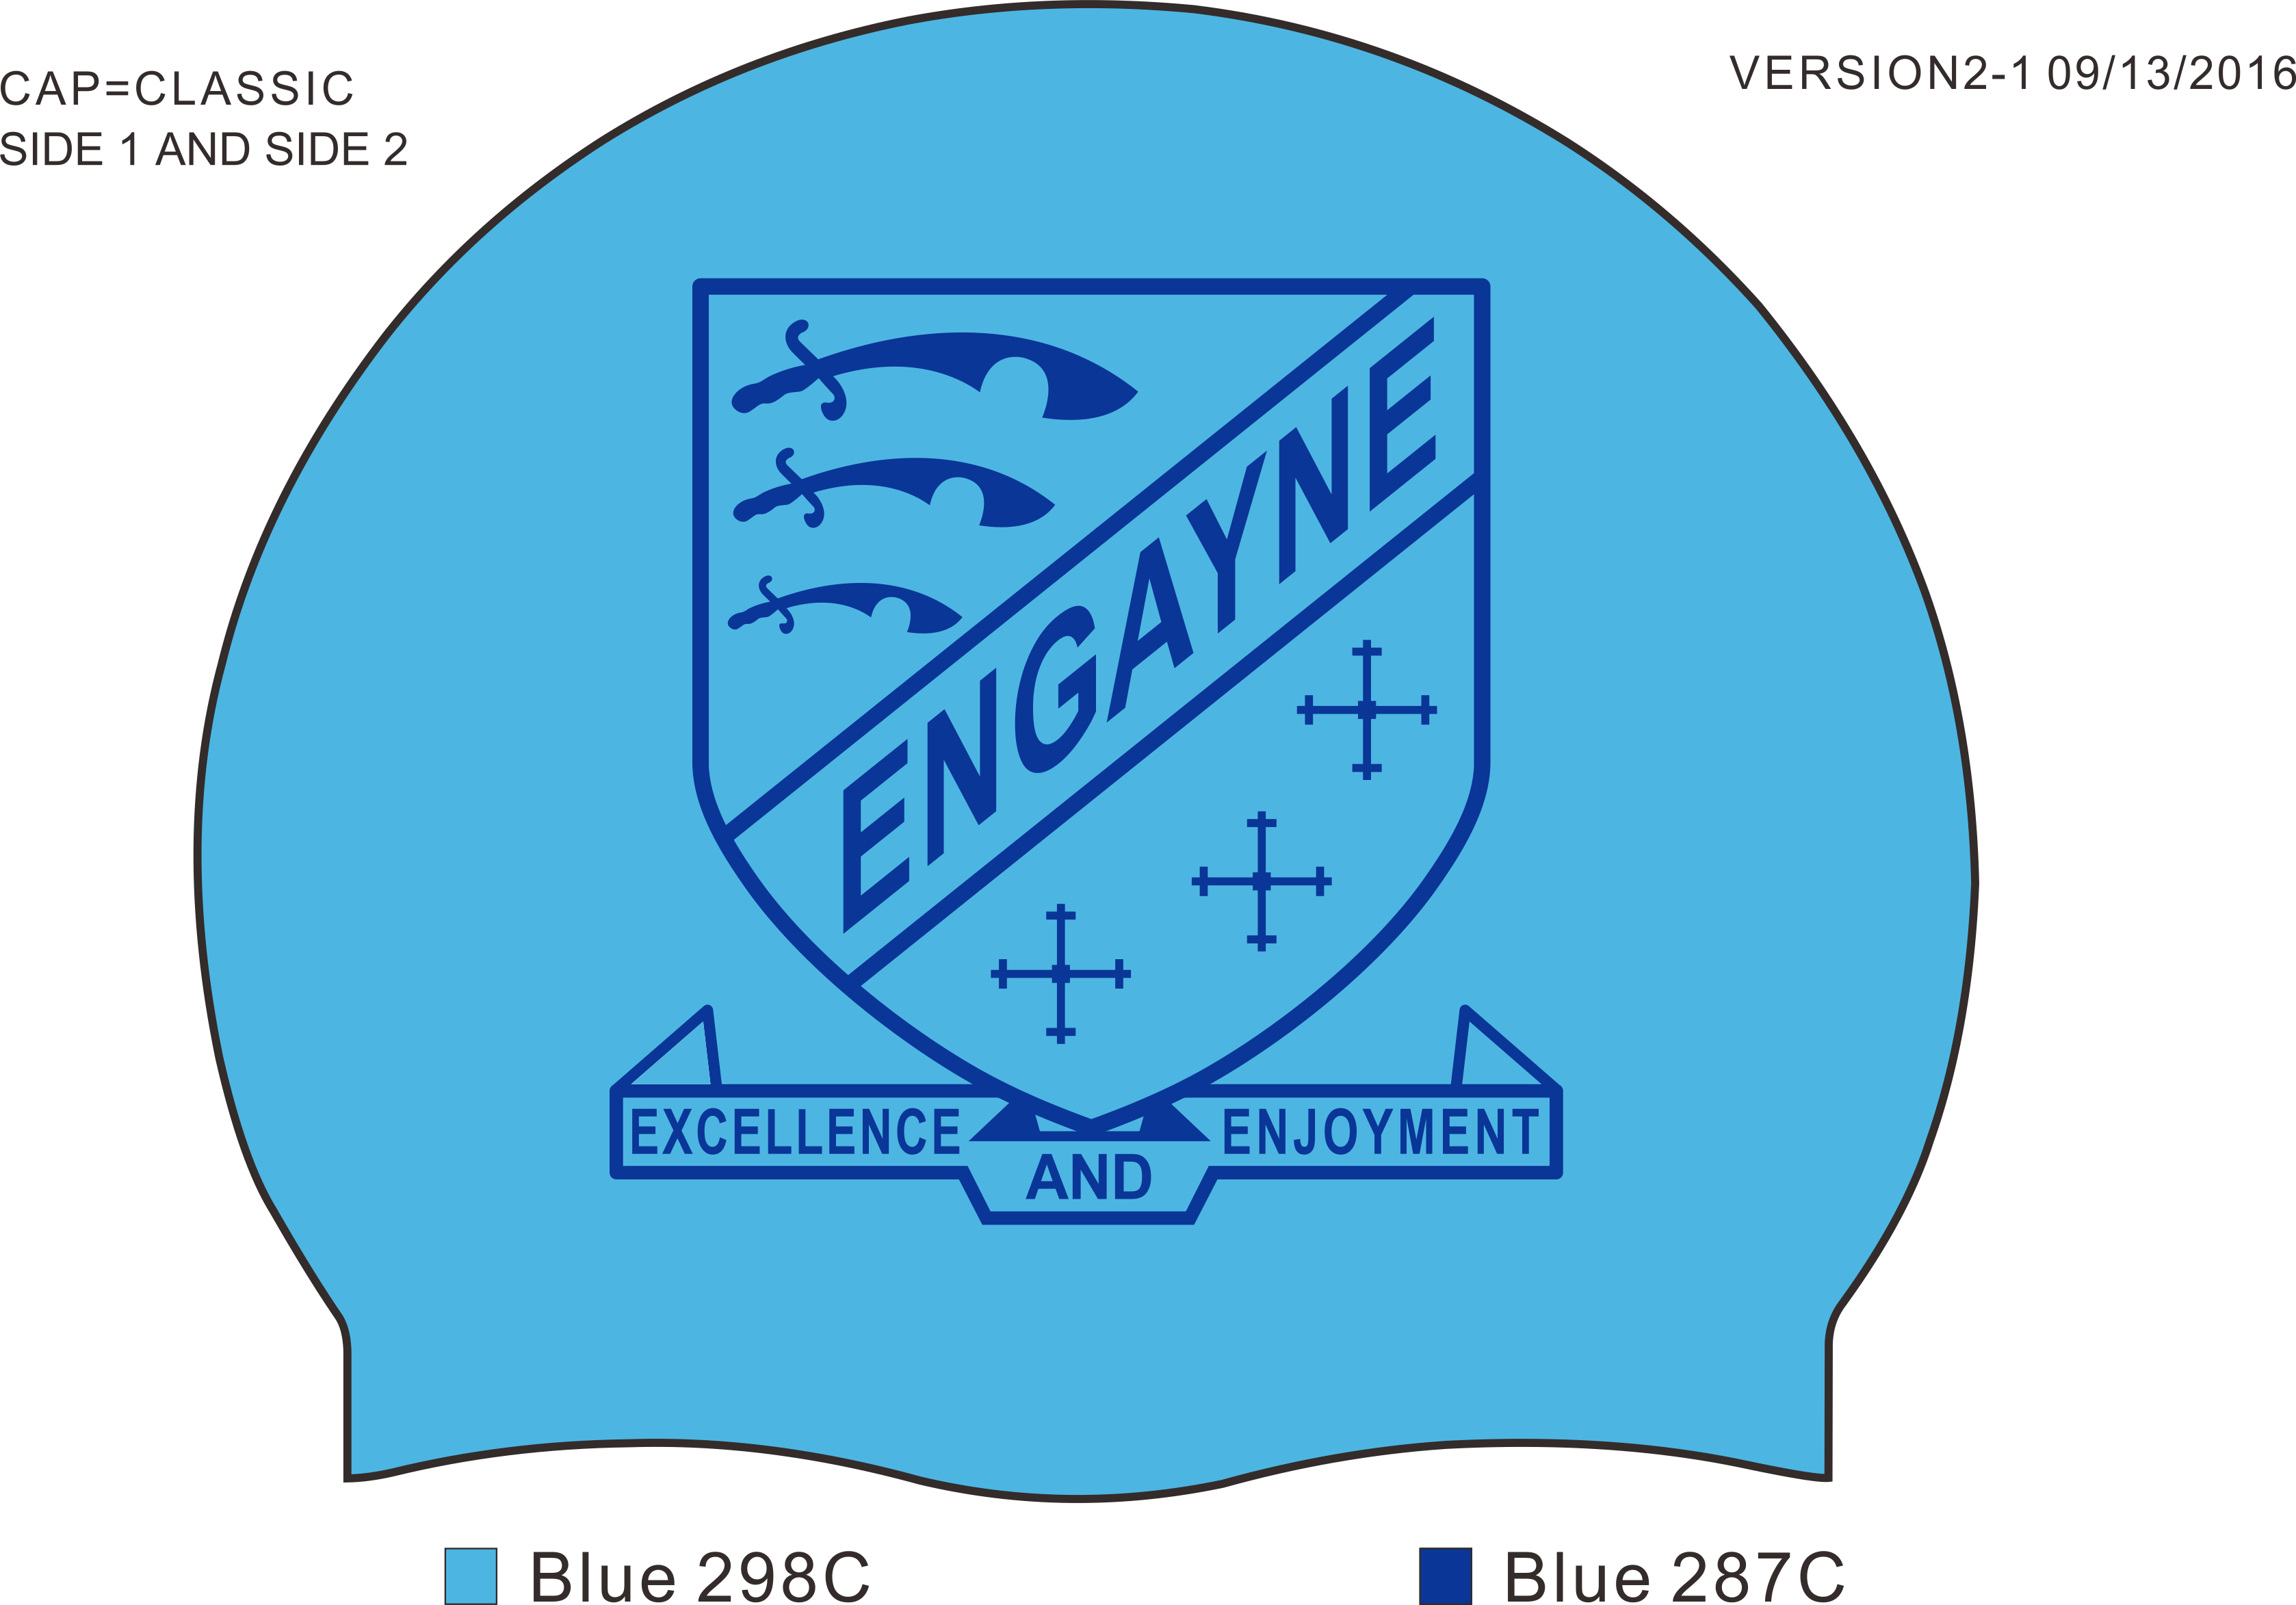 engayneblue-298c-v2-1